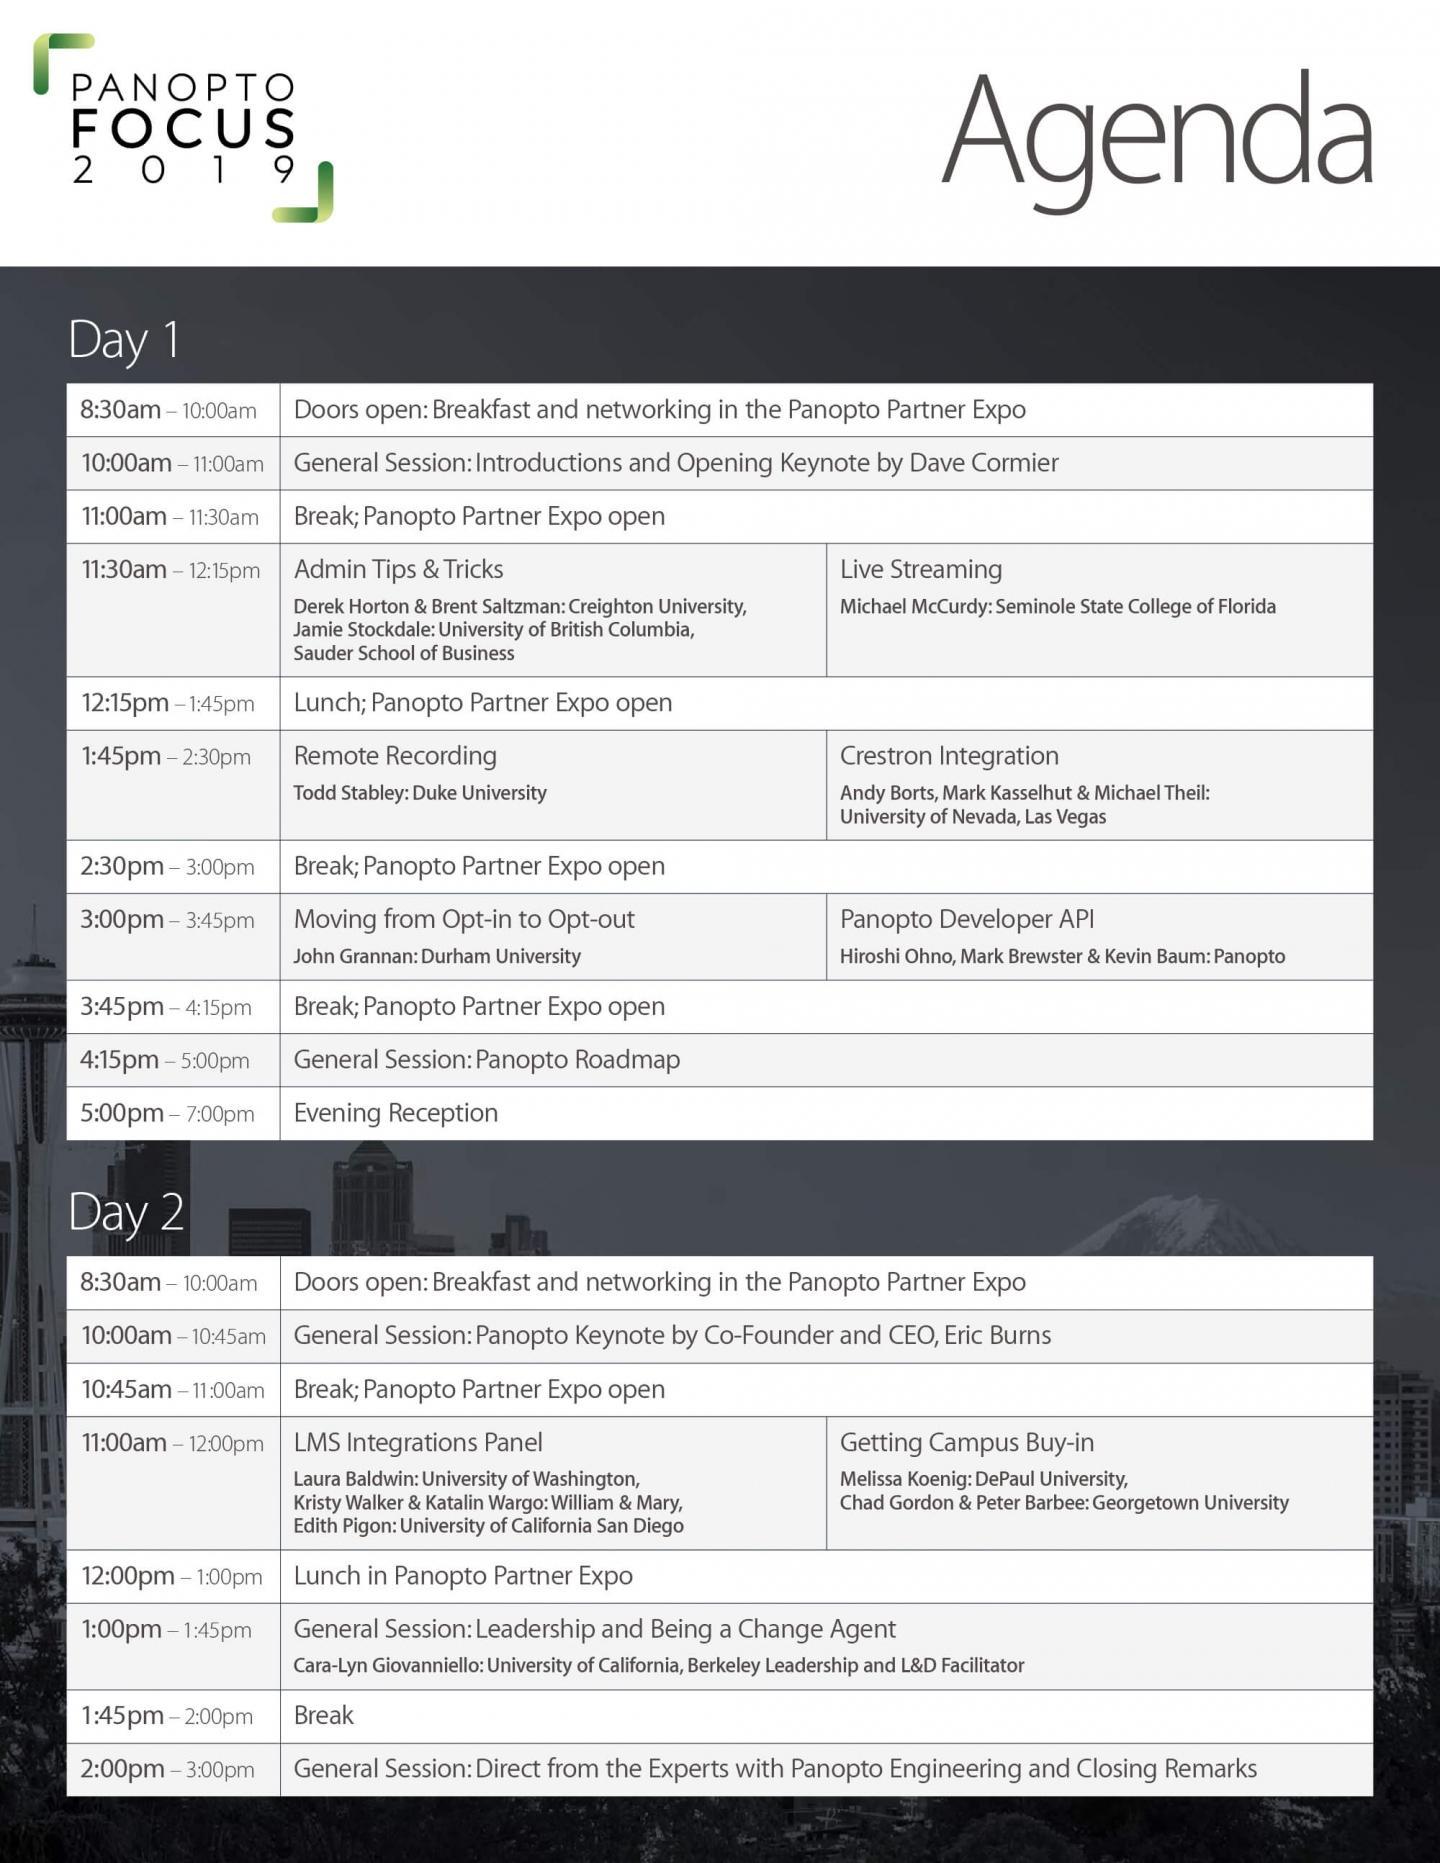 Panopto 2019 User Conference - Focus - Agenda